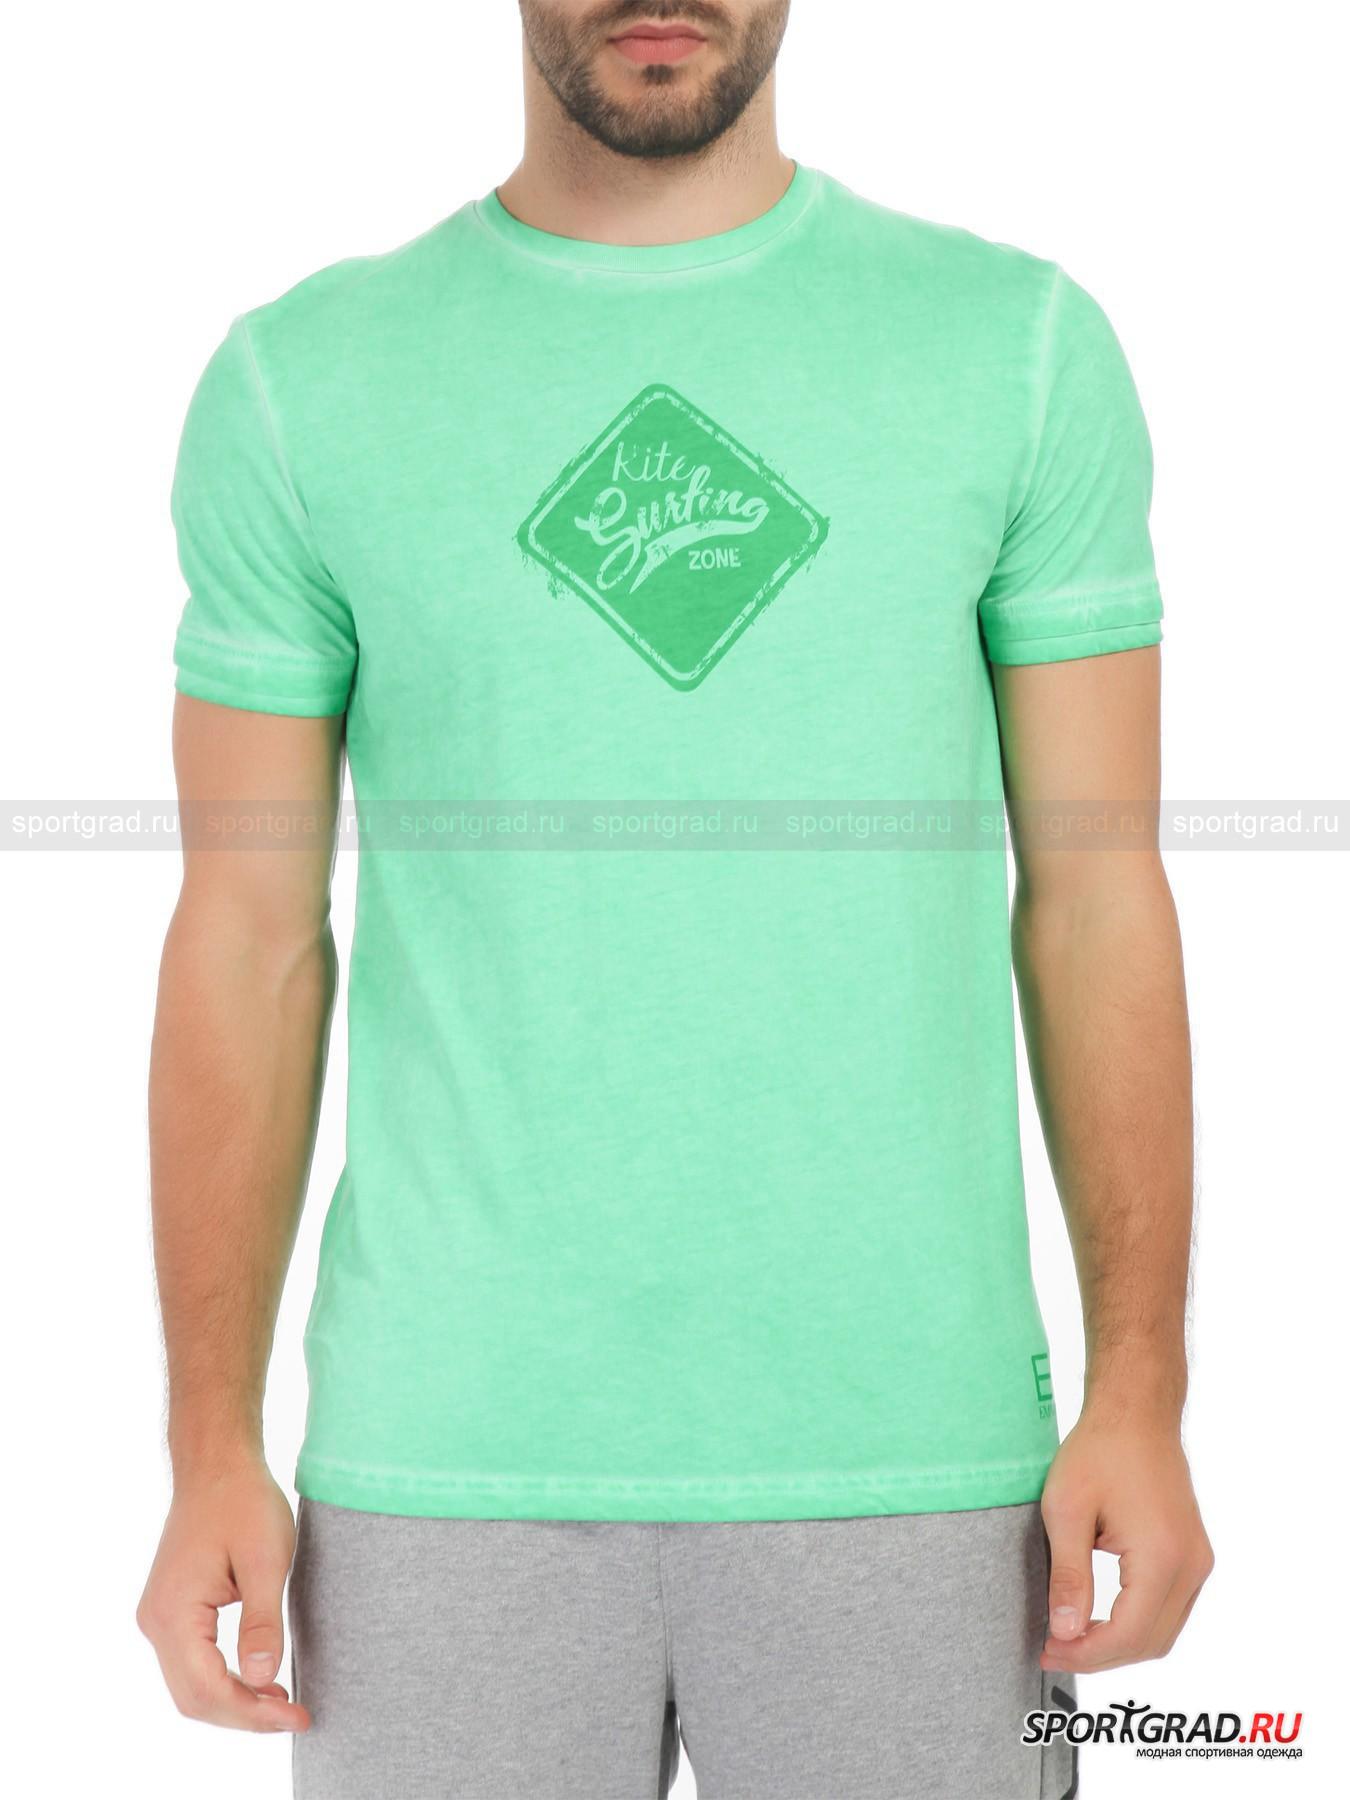 �������� ������� Sea World Surfing T-shirt EA7 Emporio Armani